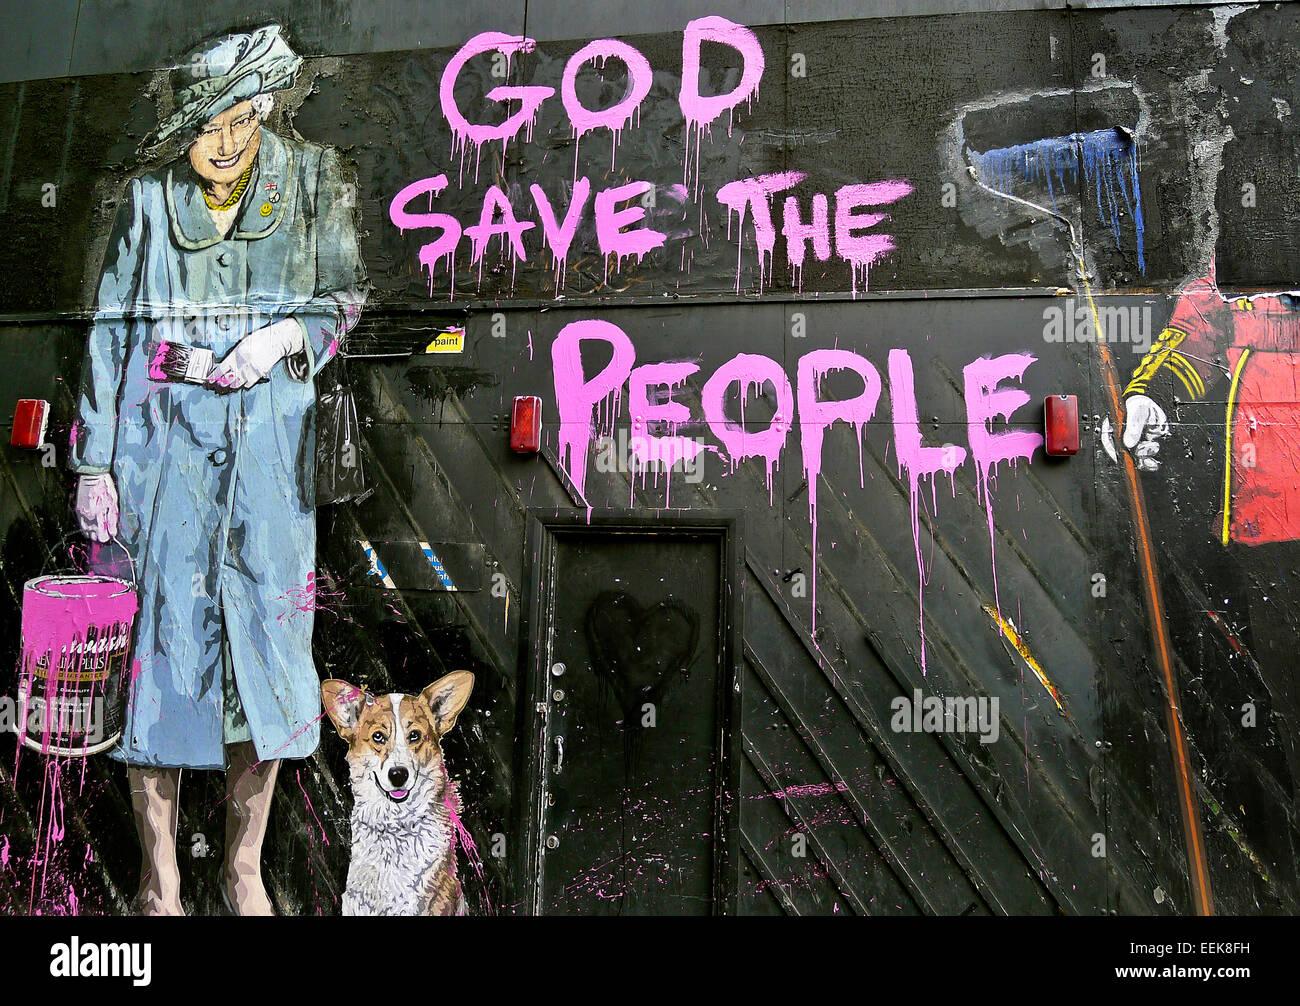 HRH Queen Elizabeth 2nd  and Corgi 'God save the Queen' graffiti - Stock Image